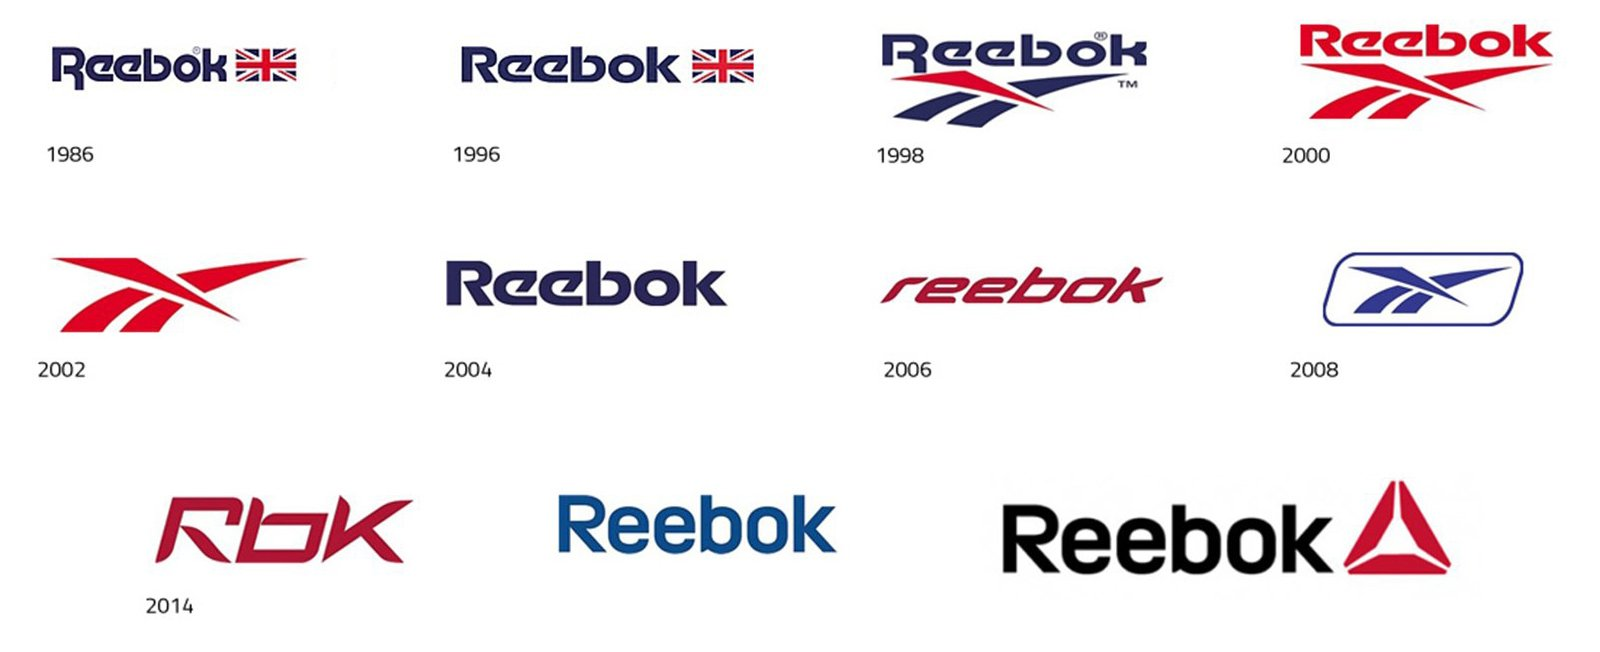 Reebok logo : histoire, signification et évolution, symbole